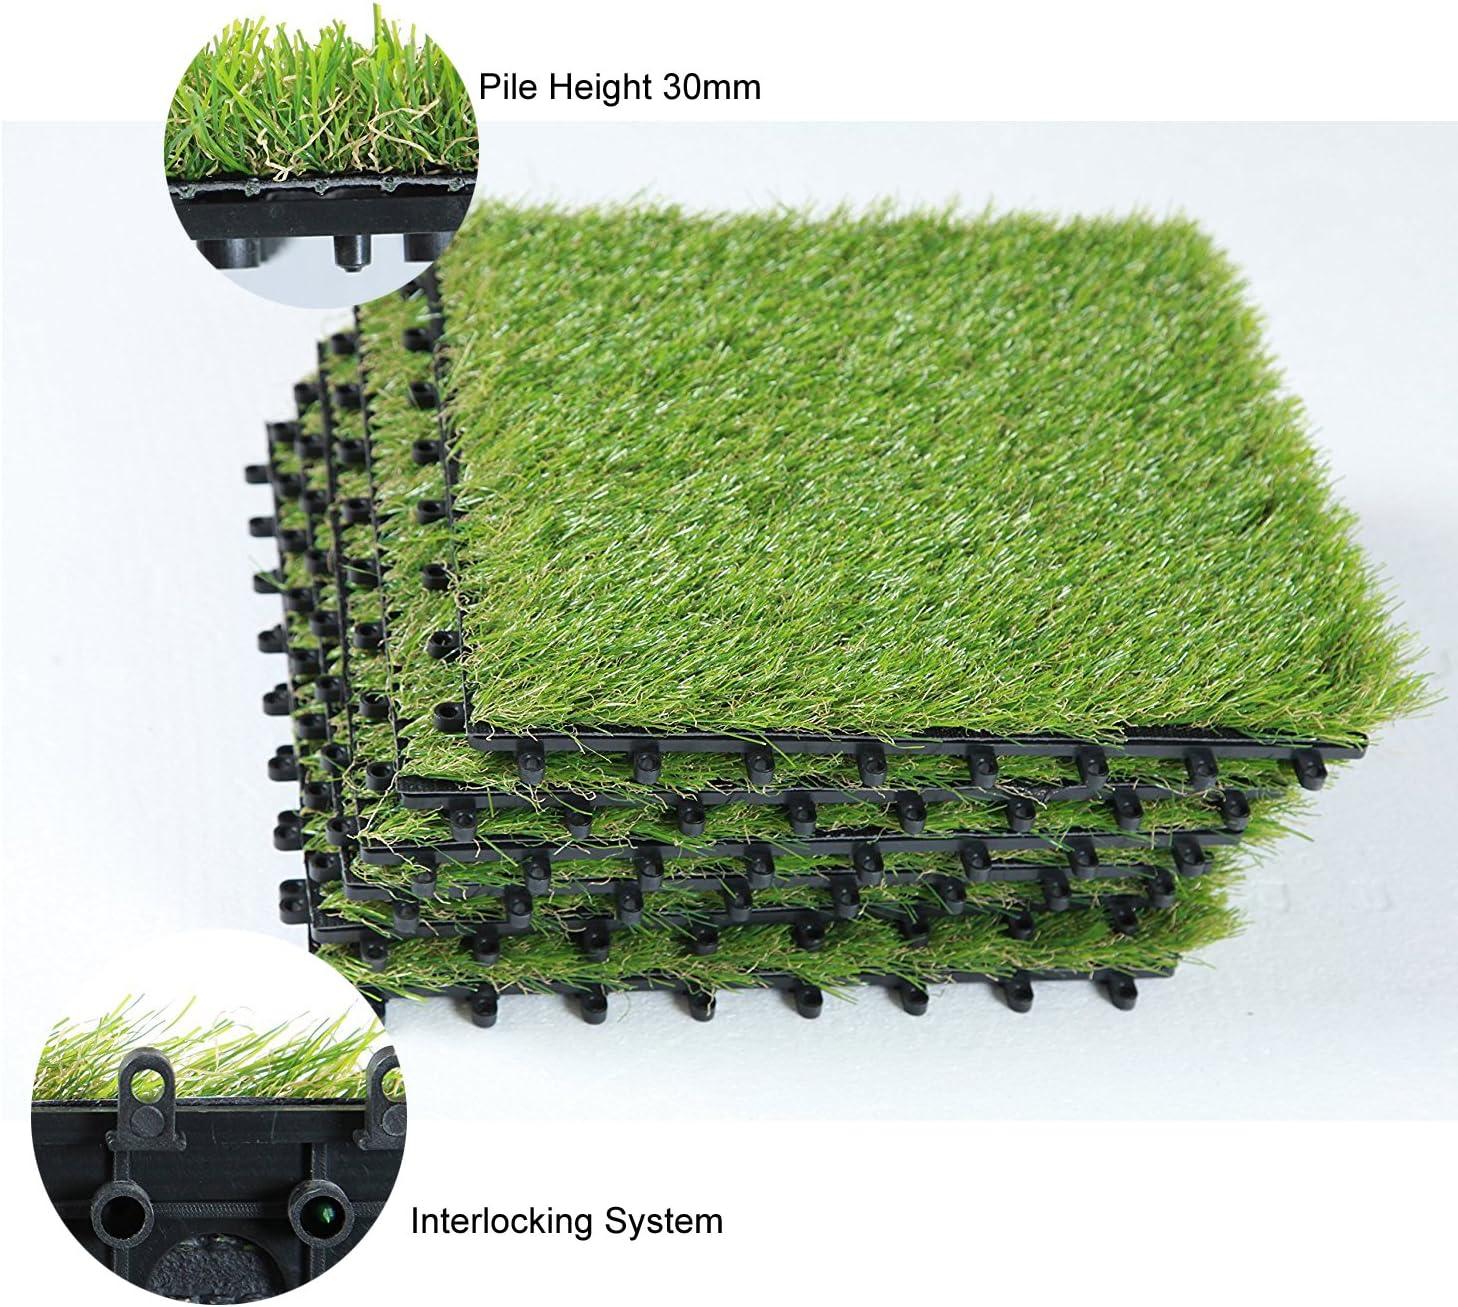 ECO MATRIX Artificial Grass Tiles Interlocking Fake Grass Deck Tile Synthetic Grass Turf Green Lawn Carpet Indoor Outdoor Grass Tile Mat for Patio Balcony Garden Flooring Decor 1'x1' (9 Packs) - -